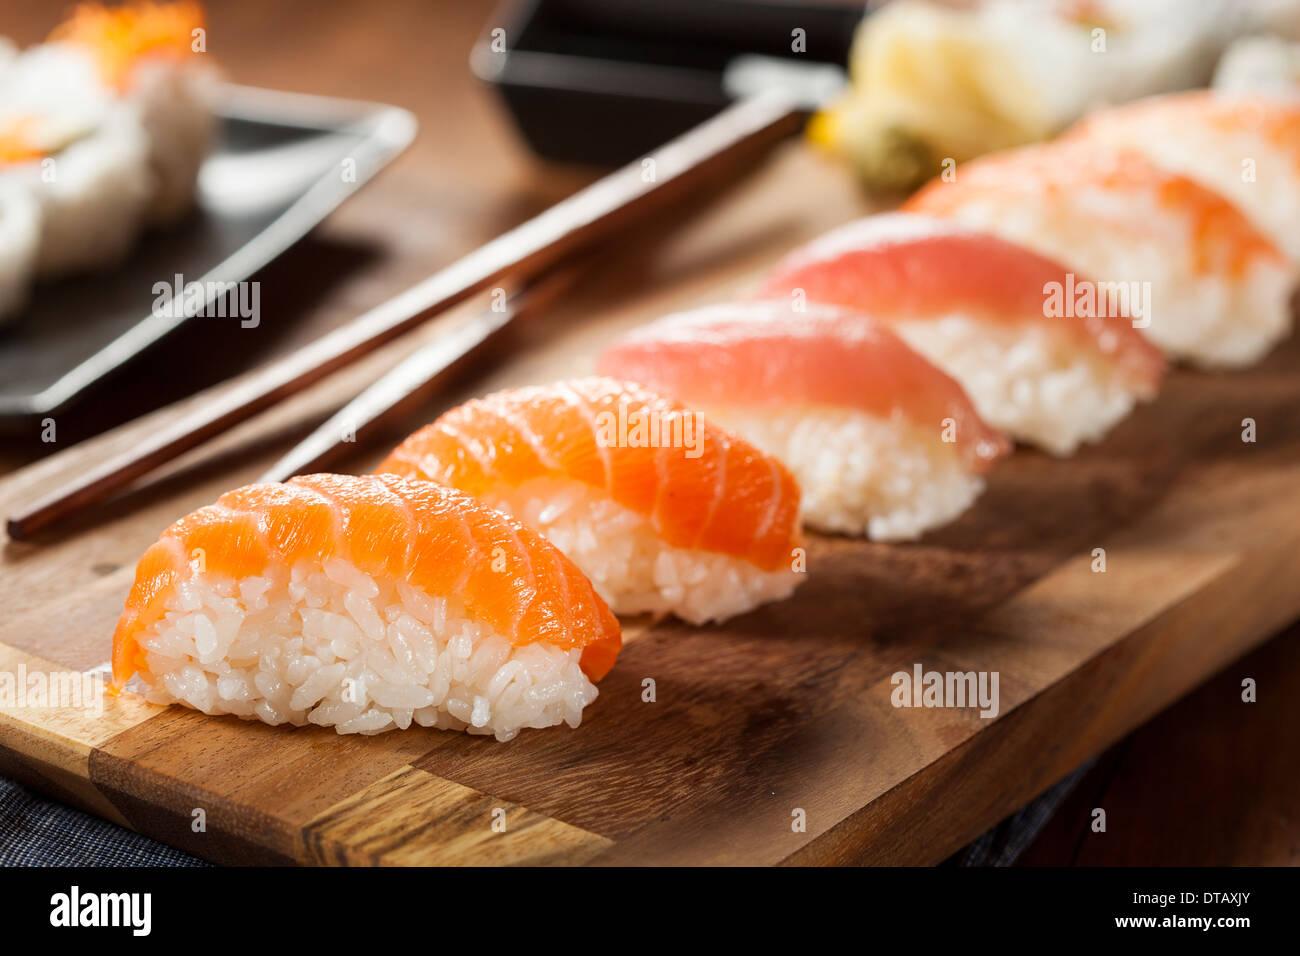 Healthy Japanese Nigiri Sushi with Rice and Fish - Stock Image